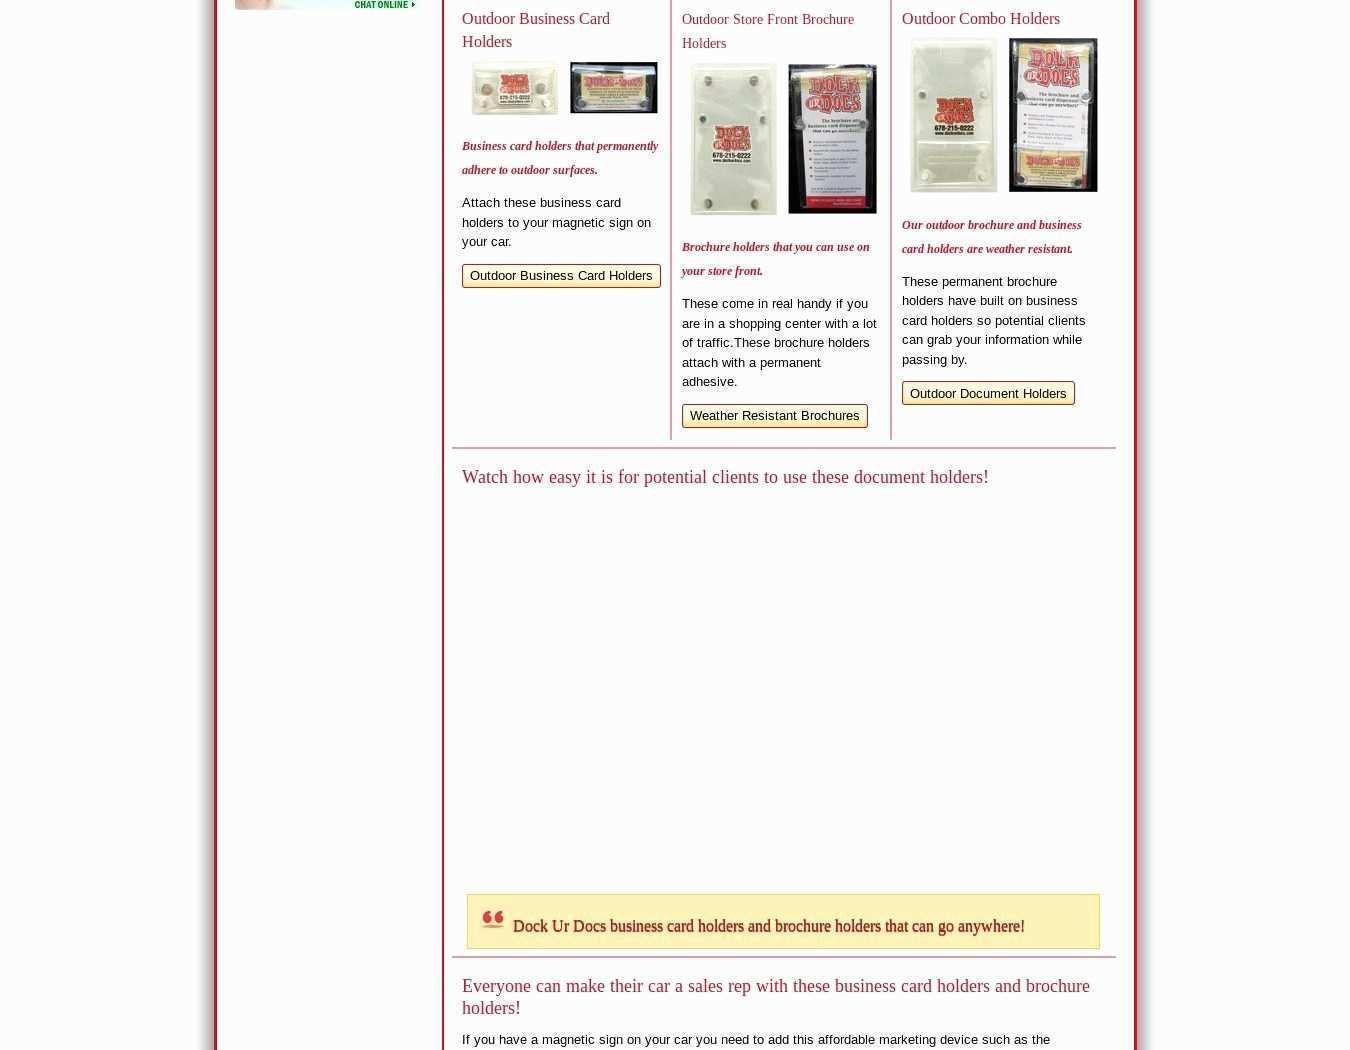 002 Magnificent Staple Busines Card Template Psd Idea Full